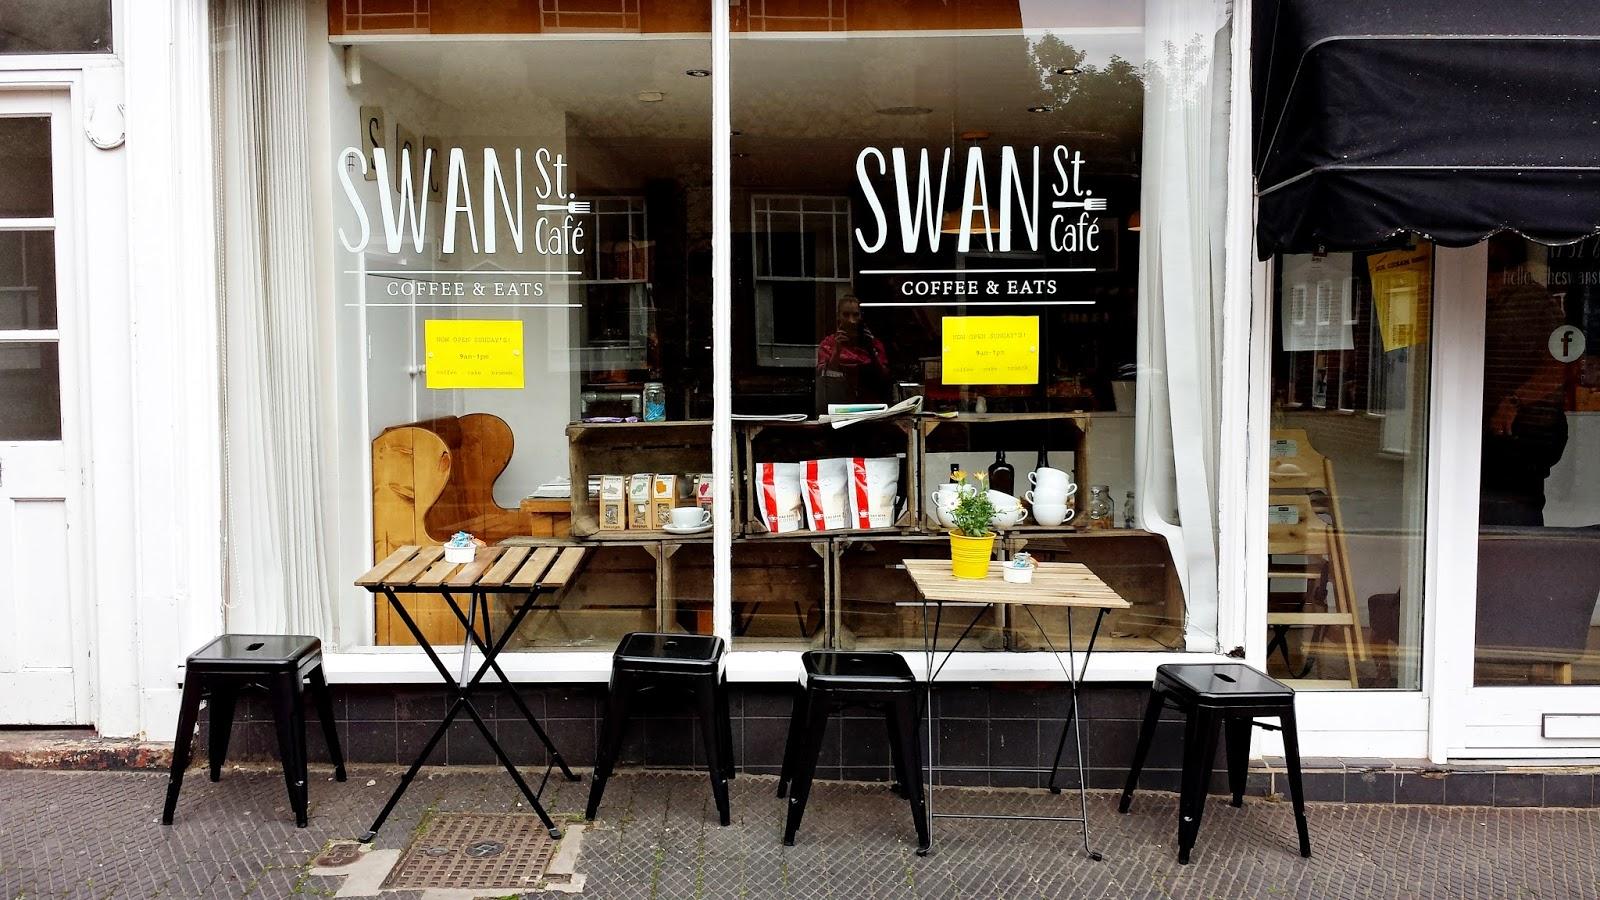 Swan Café Cape Town: Cake My Day London: Swan Street Café (ME19 6JU